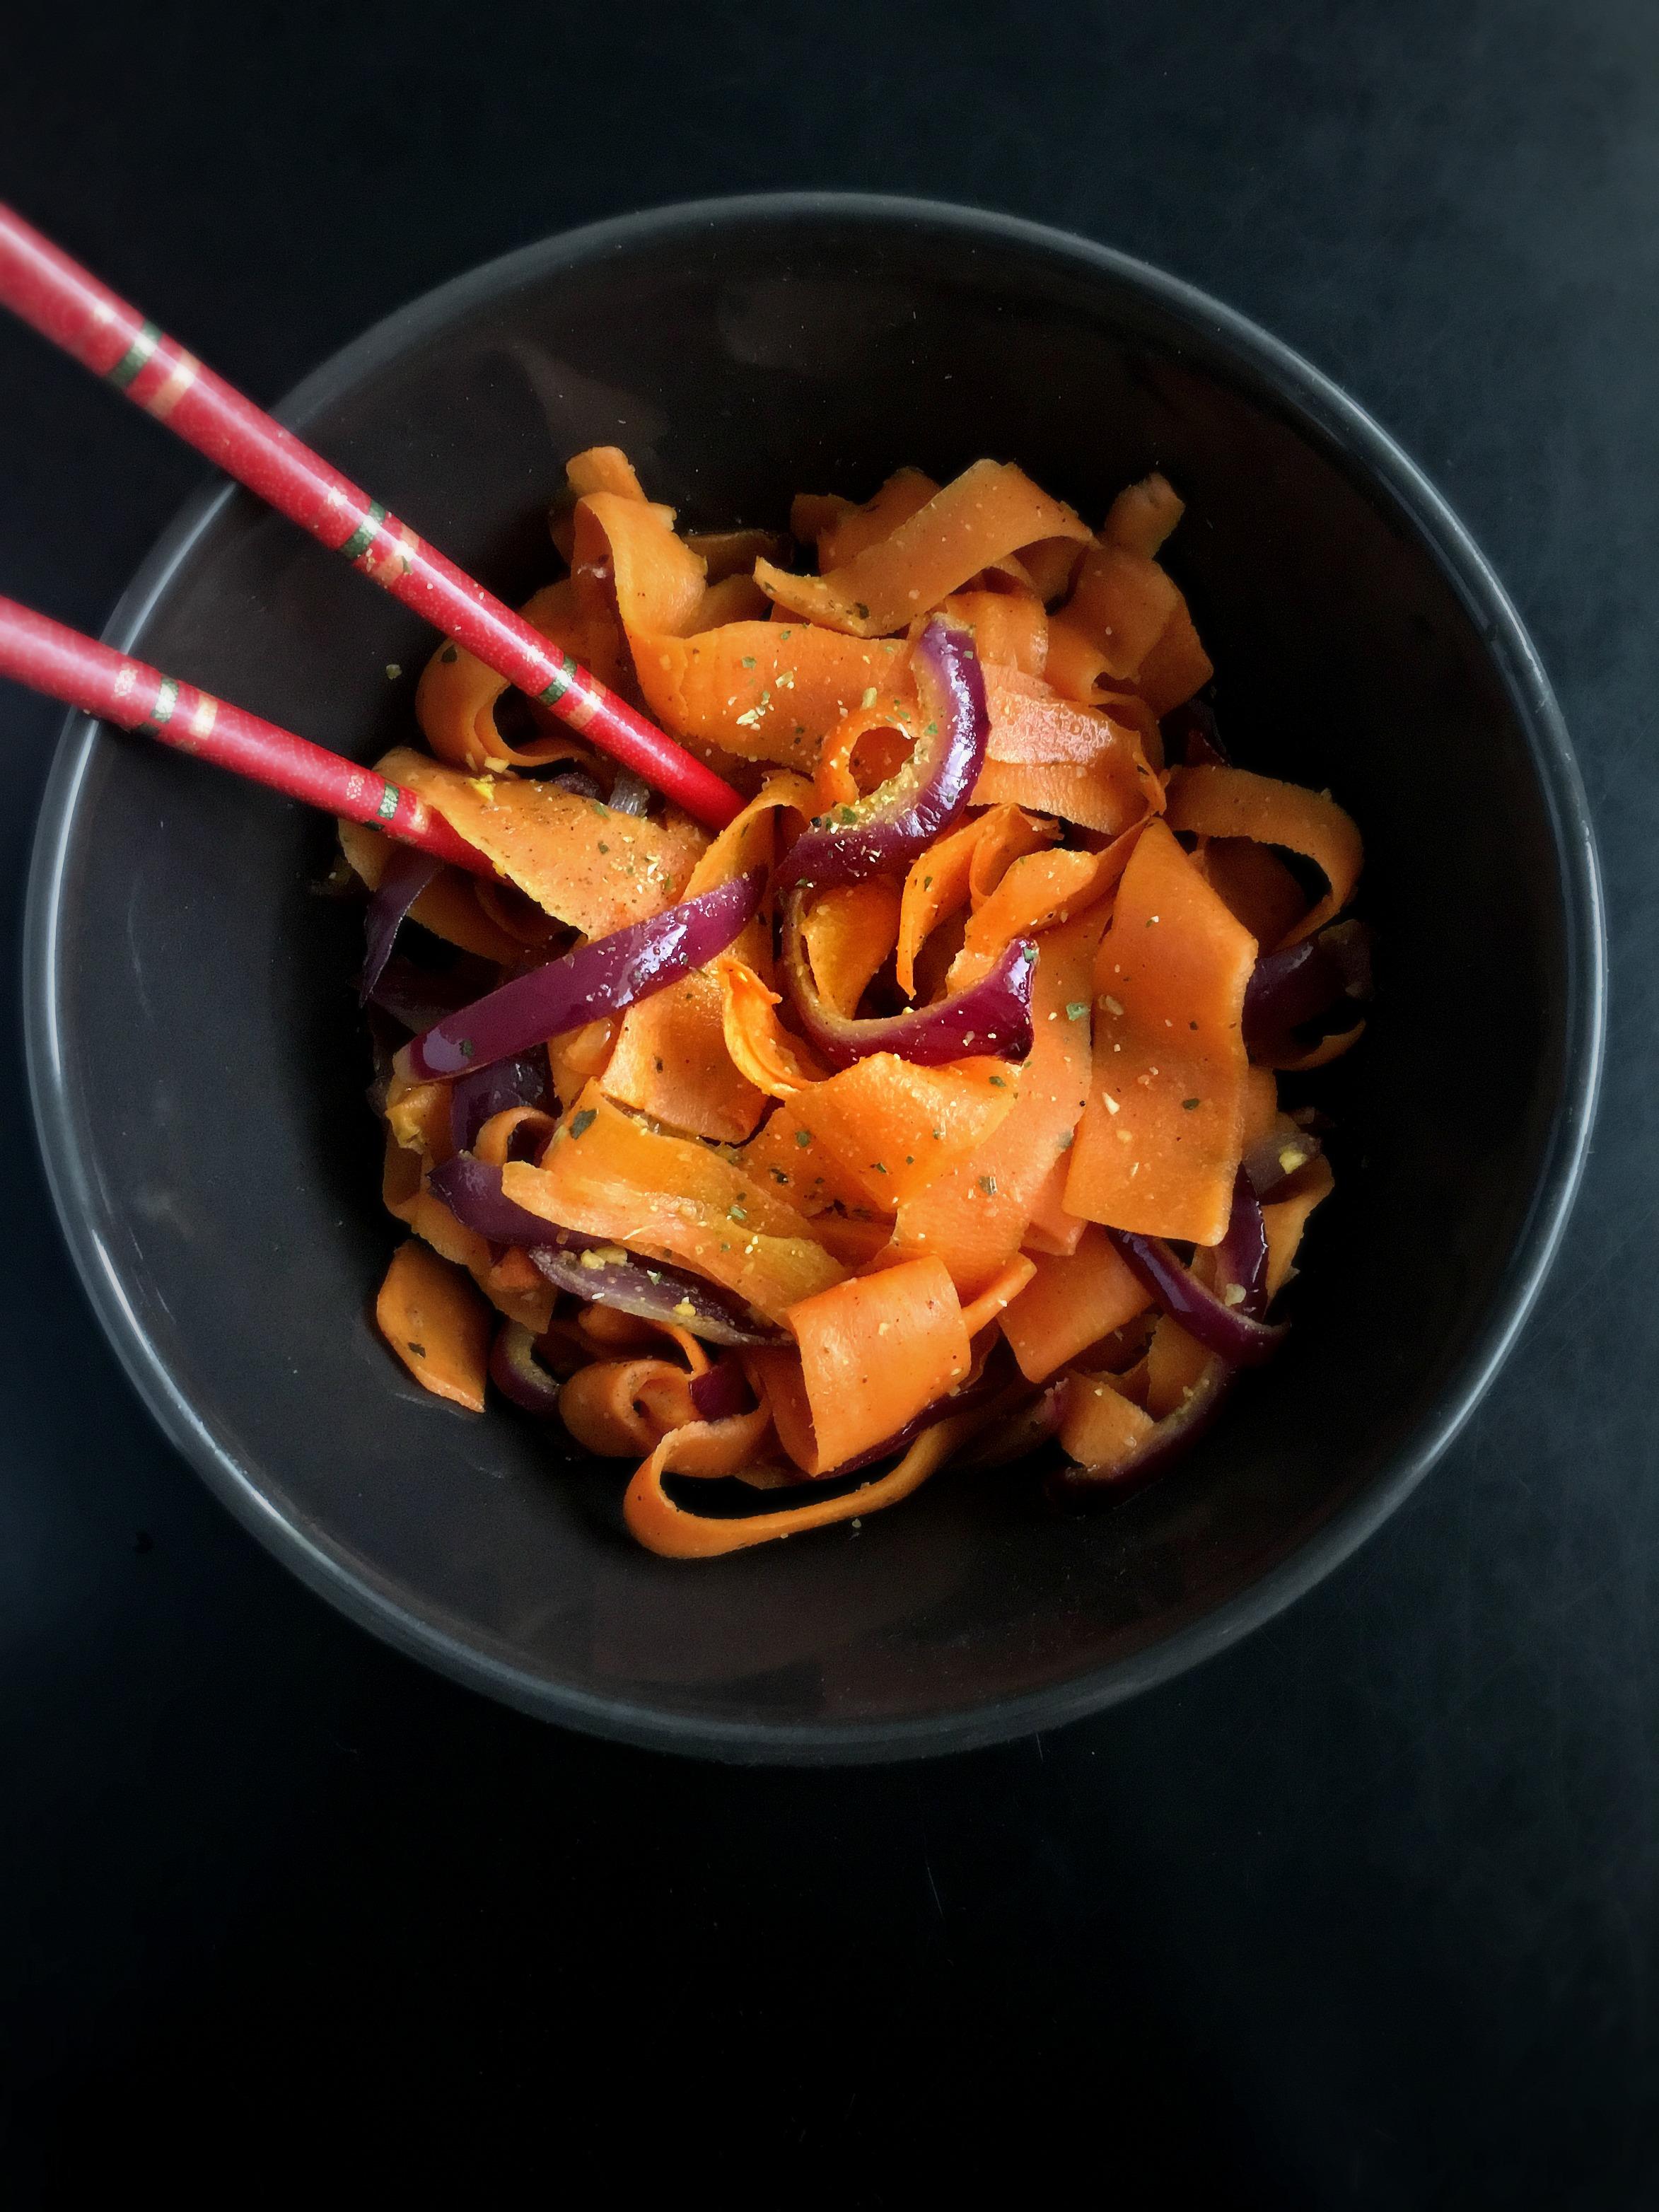 Vegan Black Pepper Carrot Onion Stir Fry